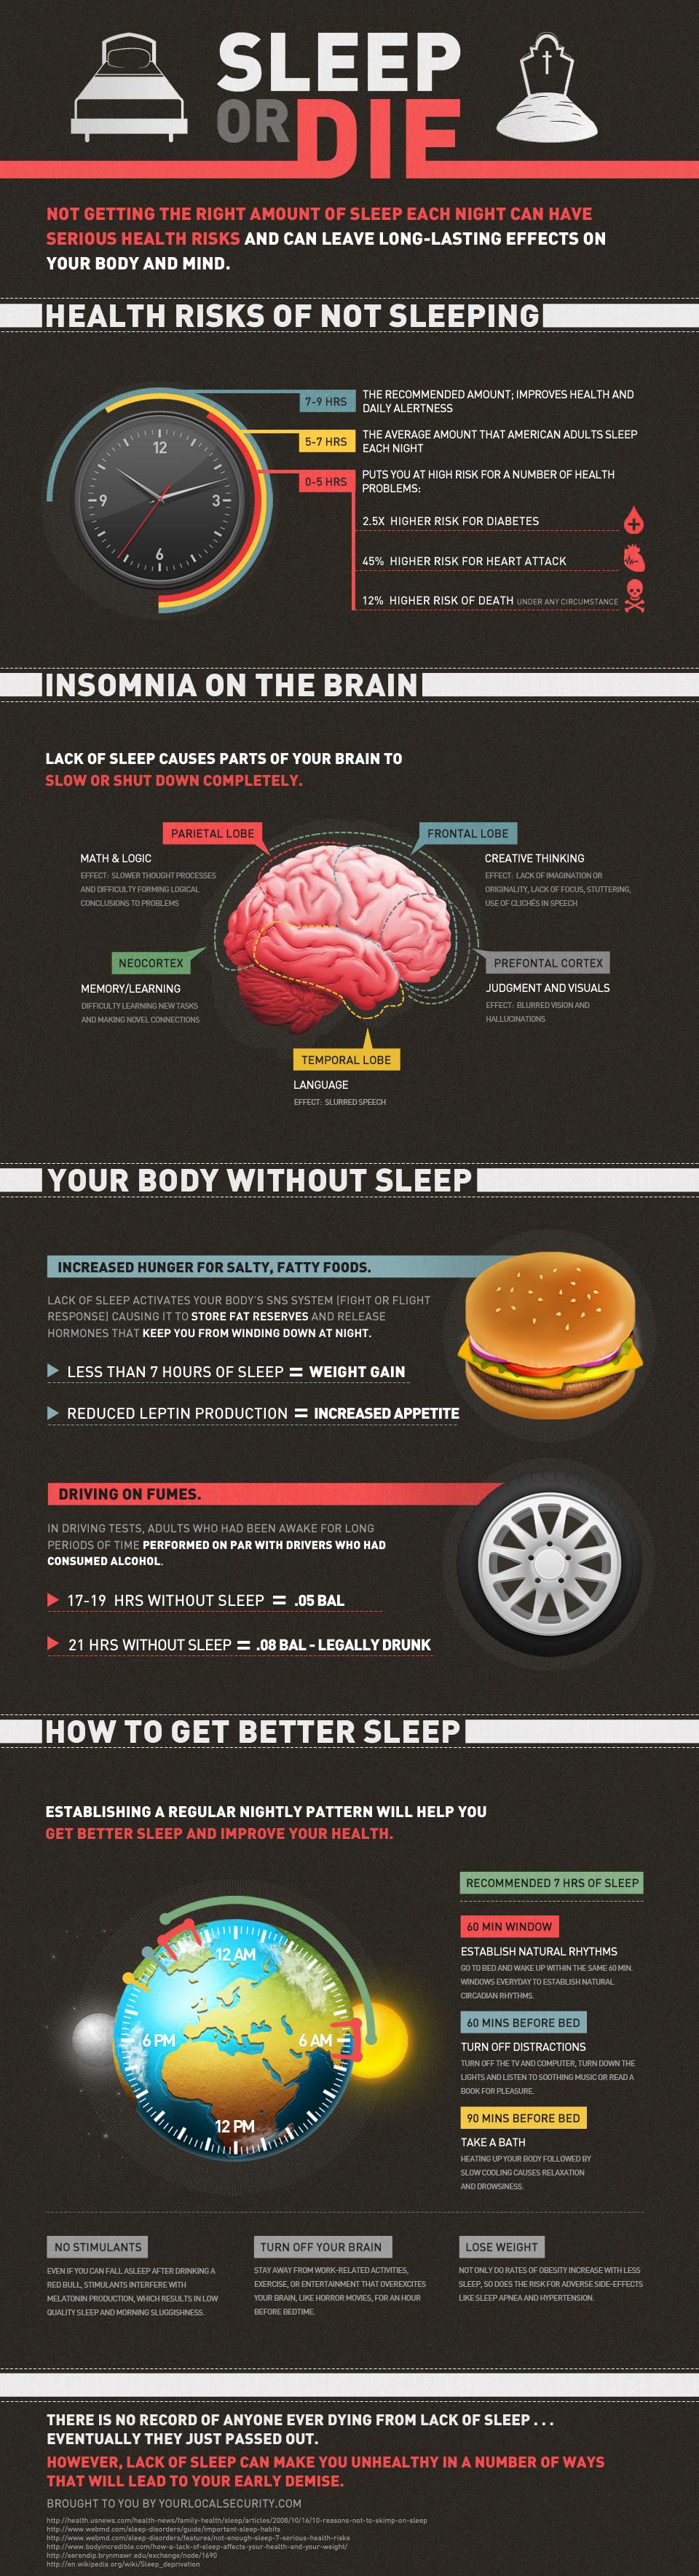 Infographic credit:Rackcdn.com